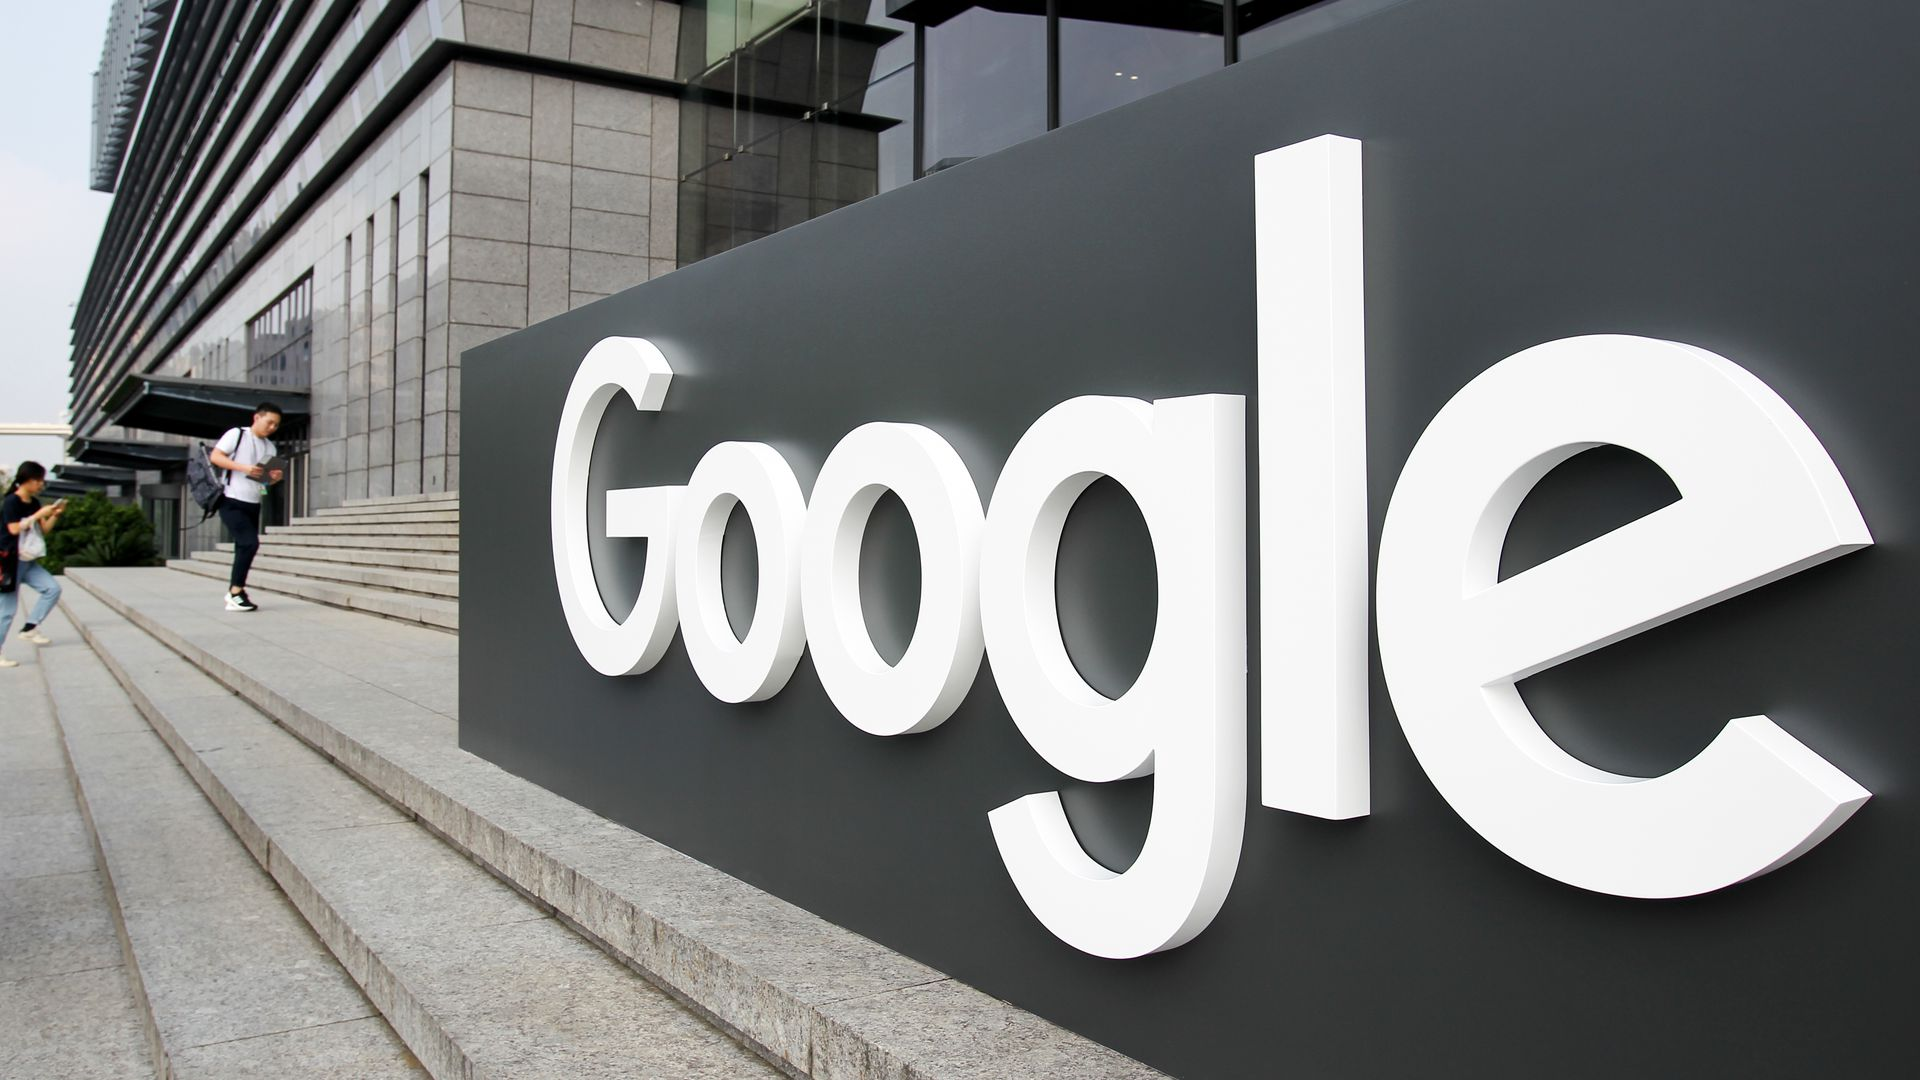 A Google logo in Shanghai, China.